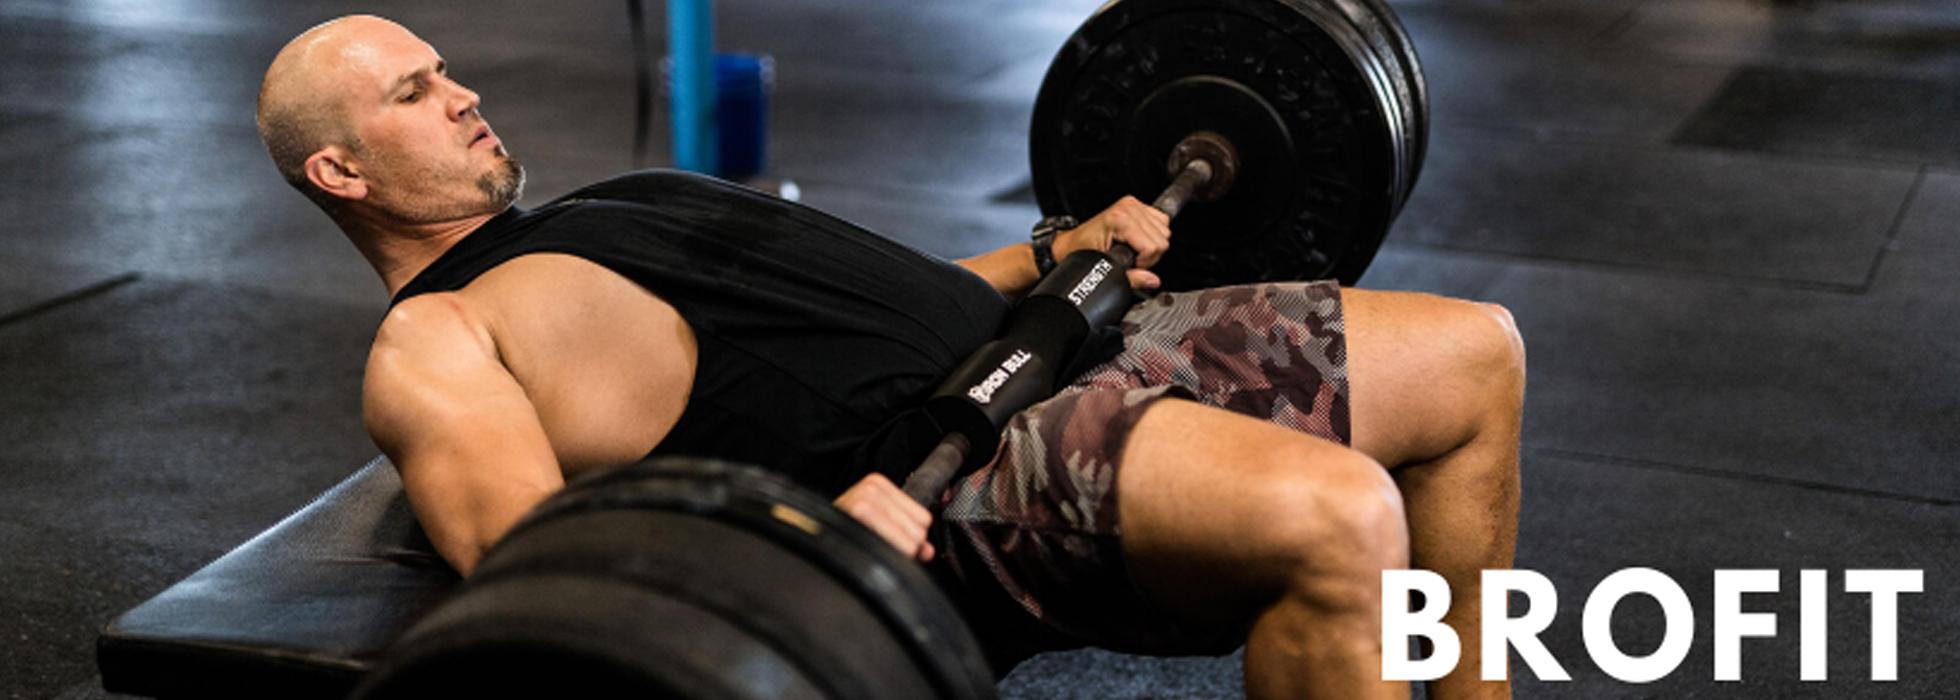 Old School Body Building Online Workouts with CrossFit Point Break